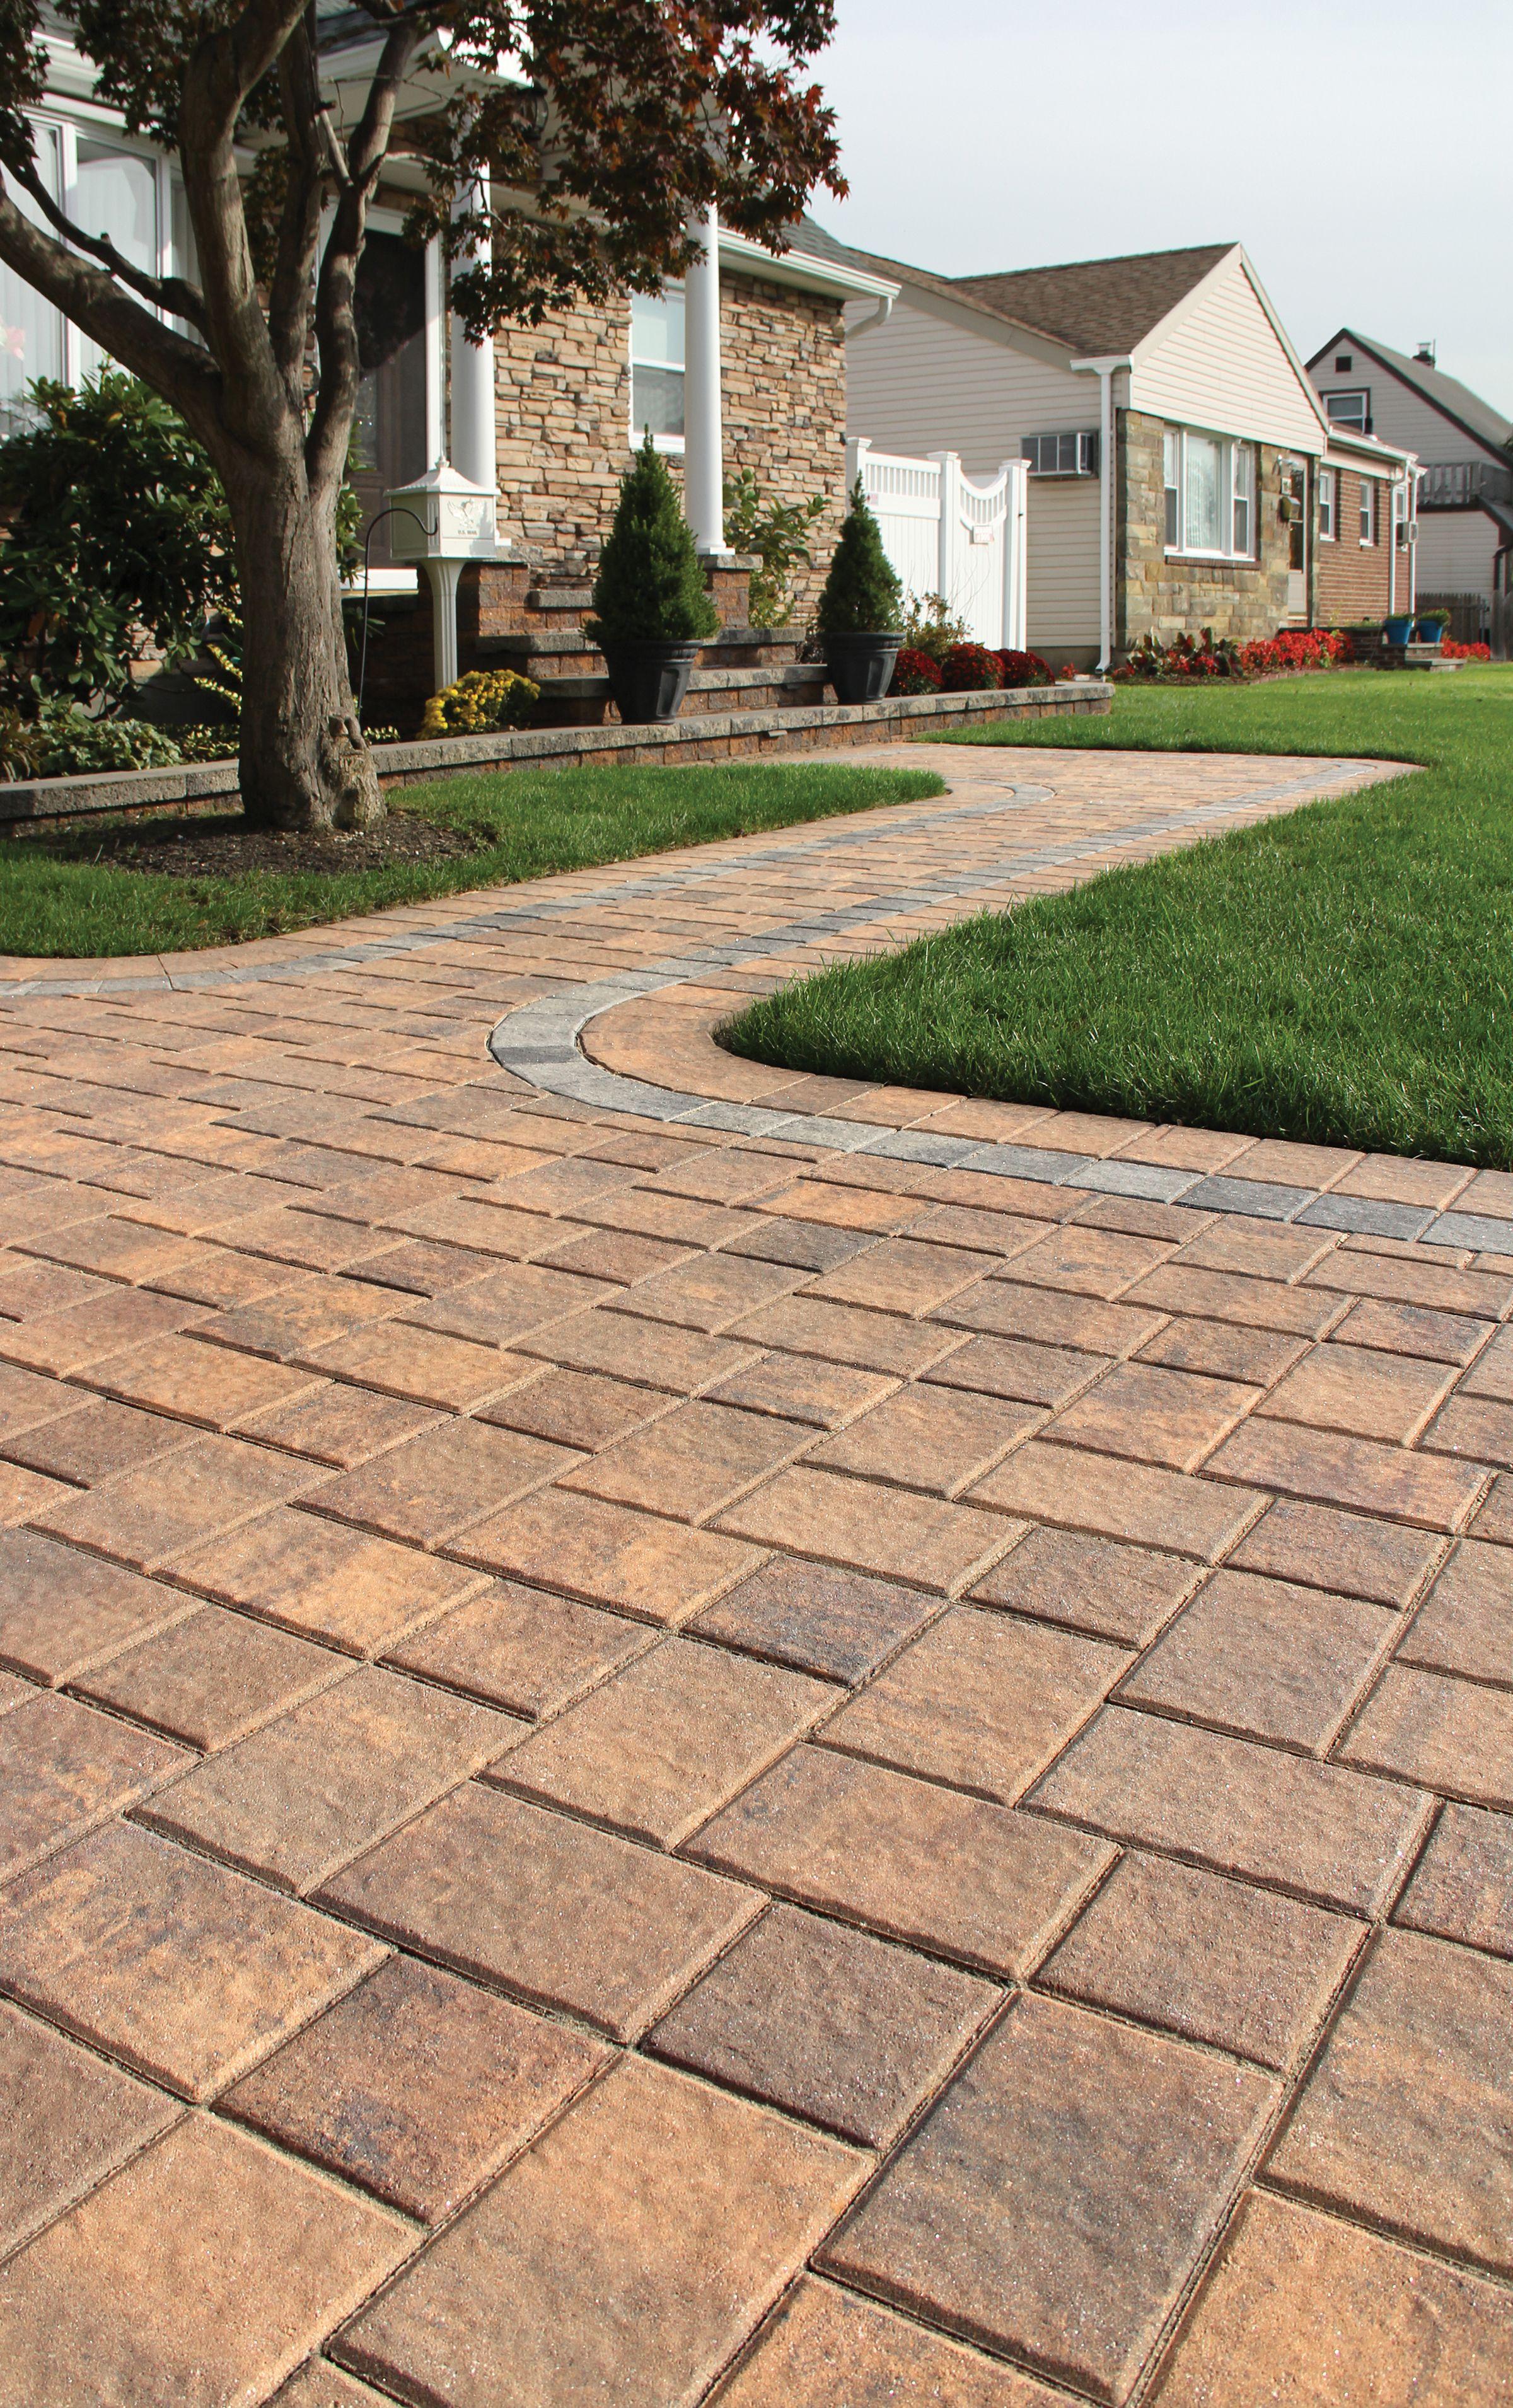 Nicolock Catalogs Driveway Landscaping Stone Driveway Paving Stones